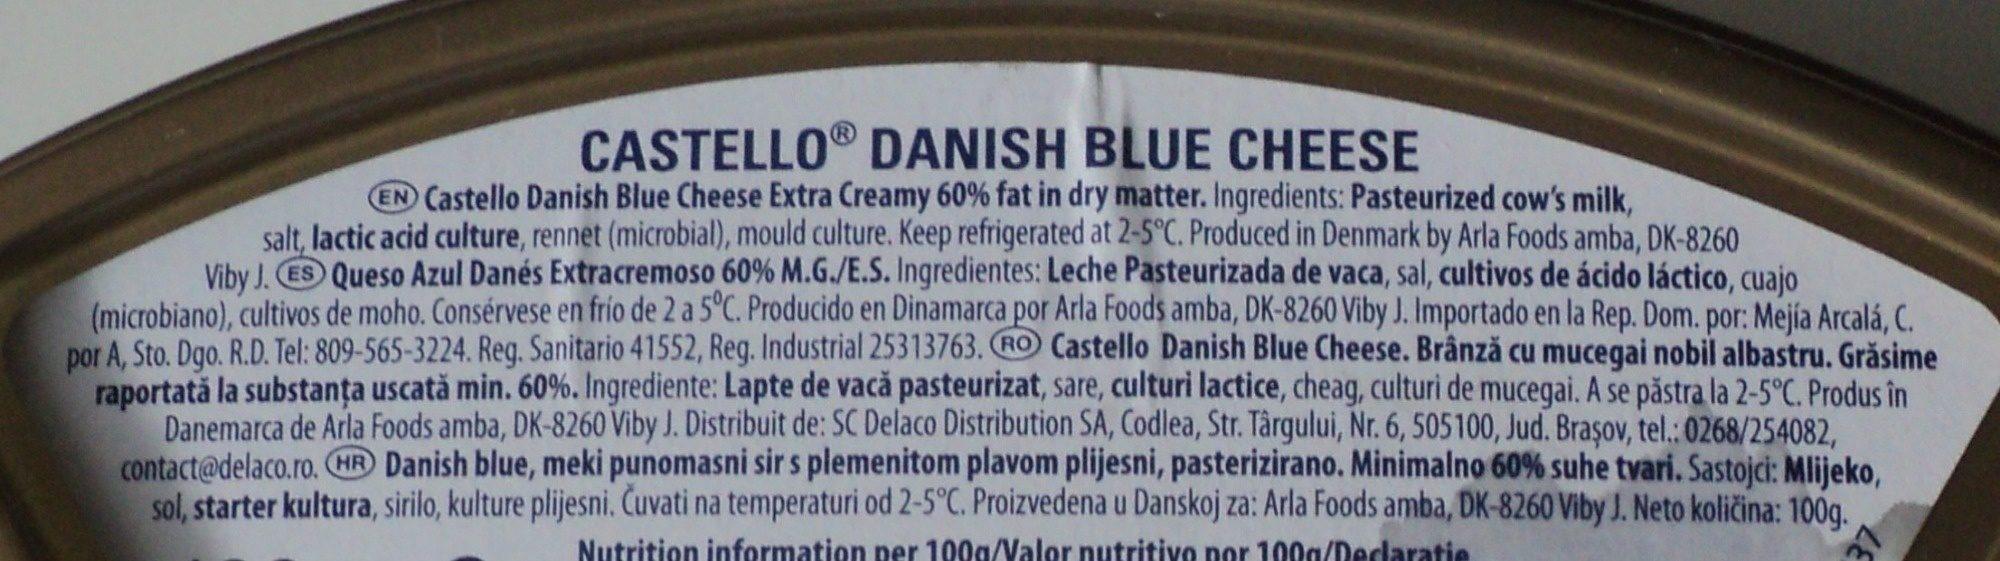 Castello Danish Blue cheese - Ingredients - ro